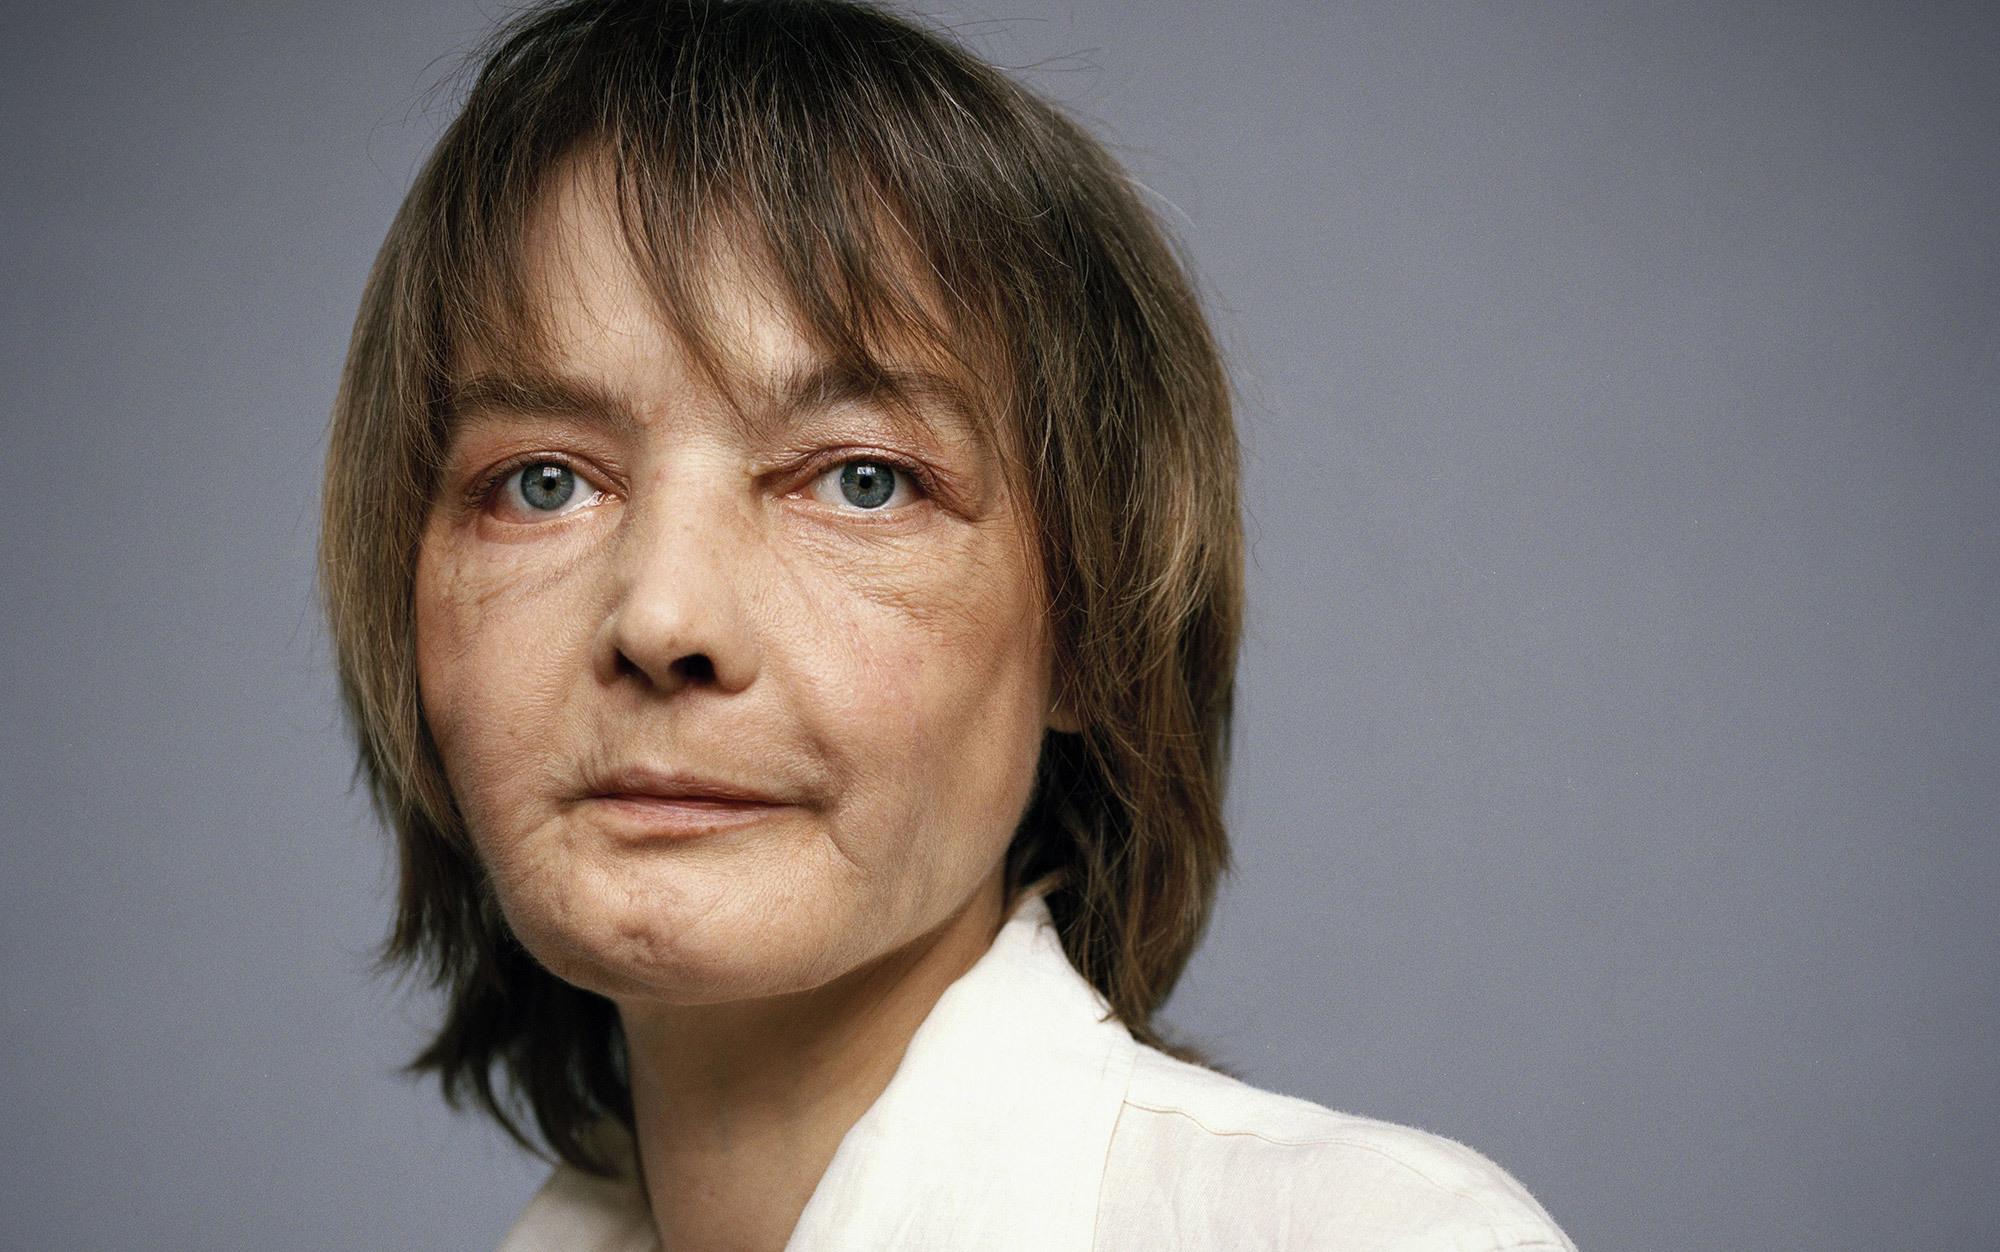 Facial transplant ethics